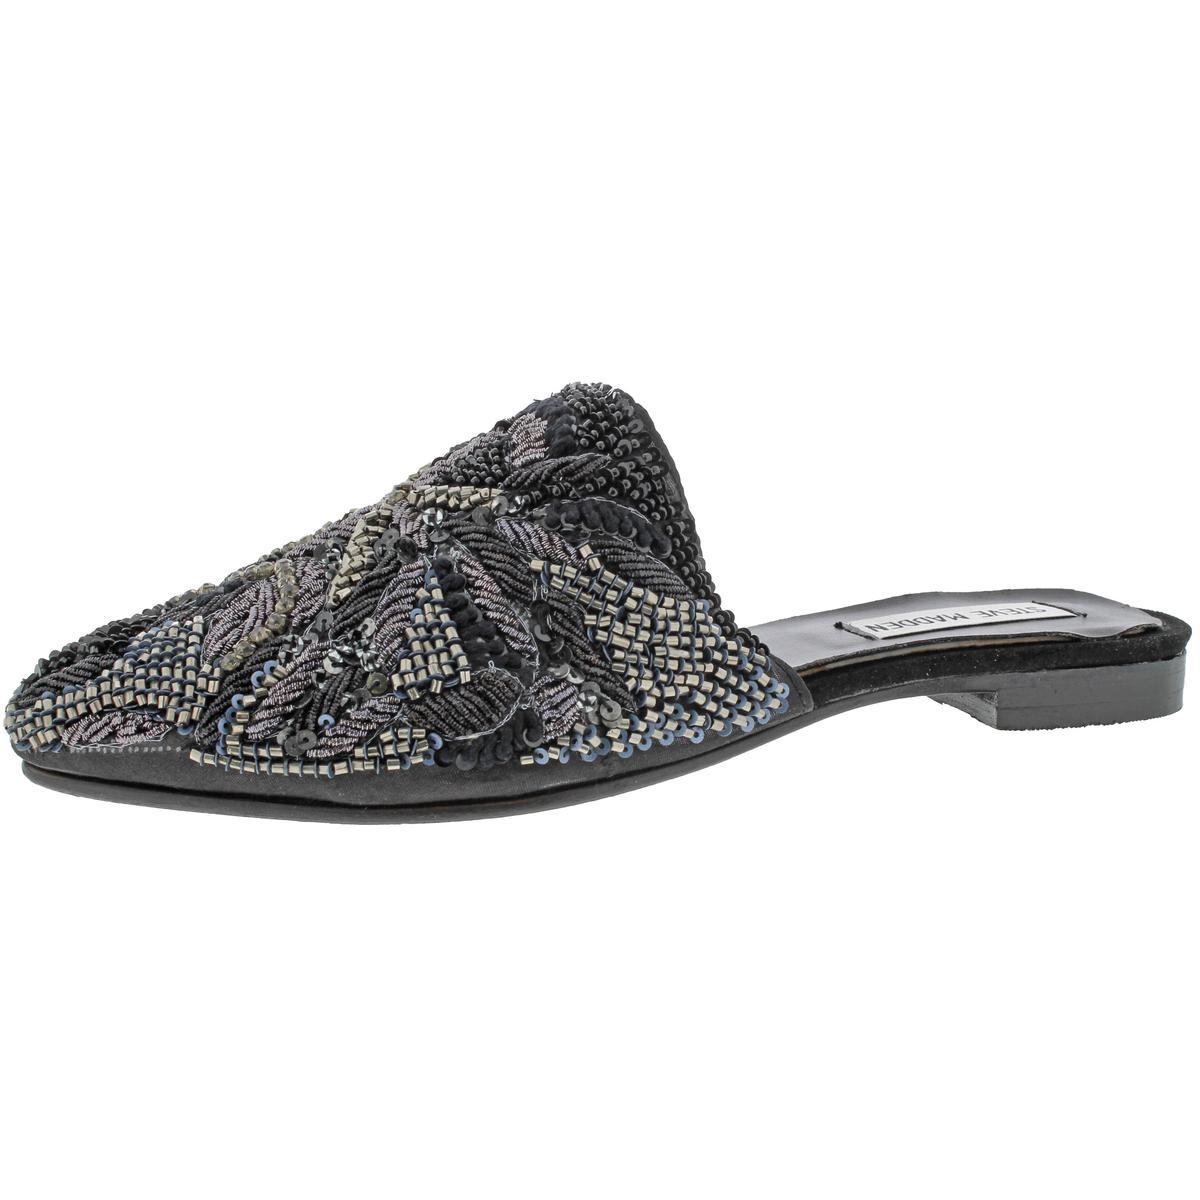 Steve Madden Womens Lyrics Embellished Shoes Pointed Toe Loafer Mule Shoes Embellished BHFO 6563 349d80